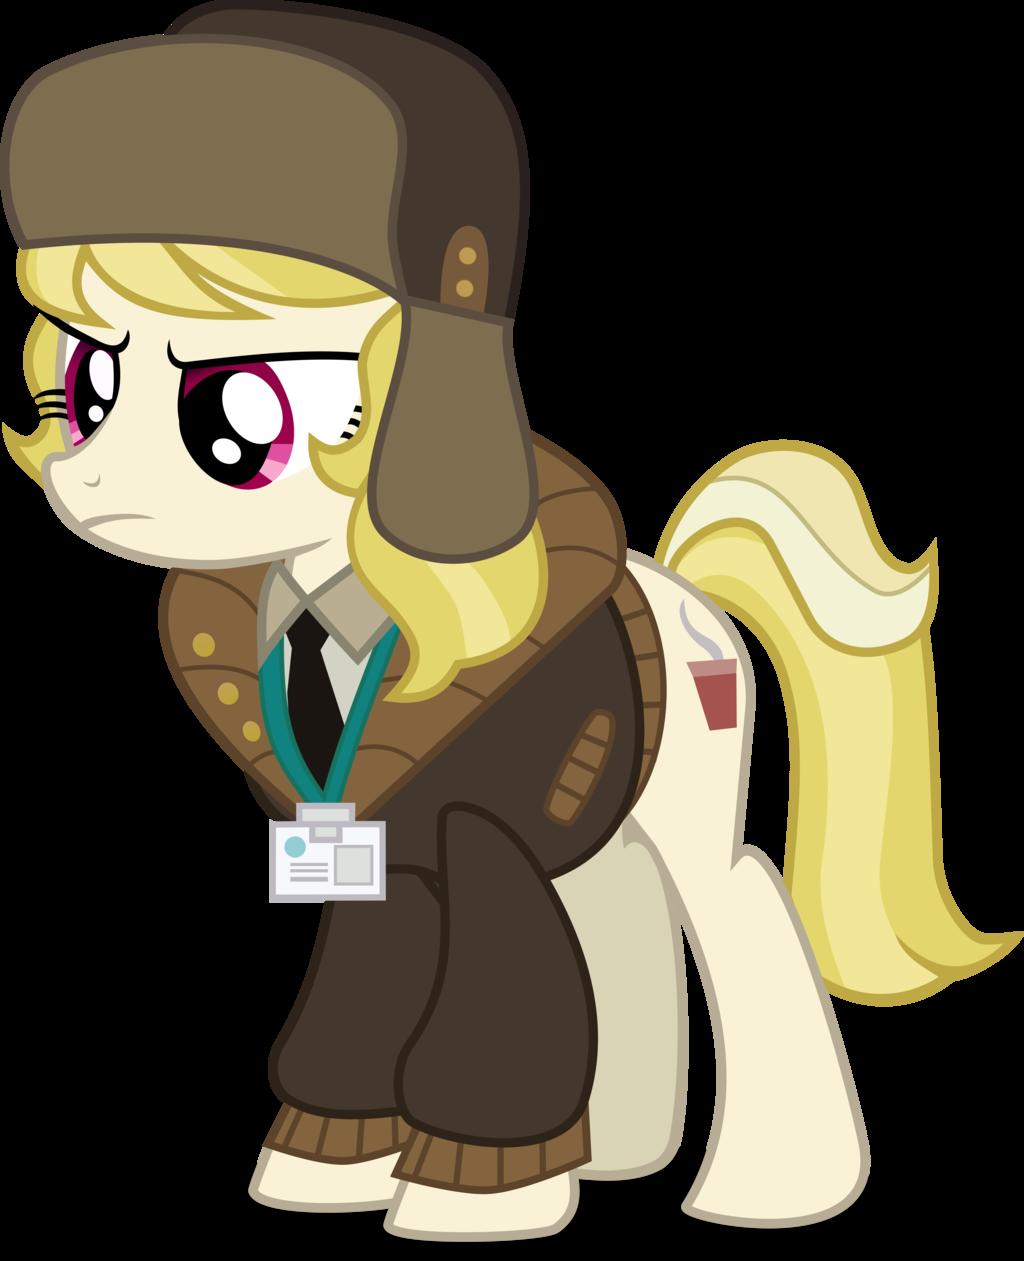 Pony Applejack Marge Gunderson Fluttershy Mammal Vertebrate Horse Like Mammal Cartoon Fictional Character Horse Vision Care